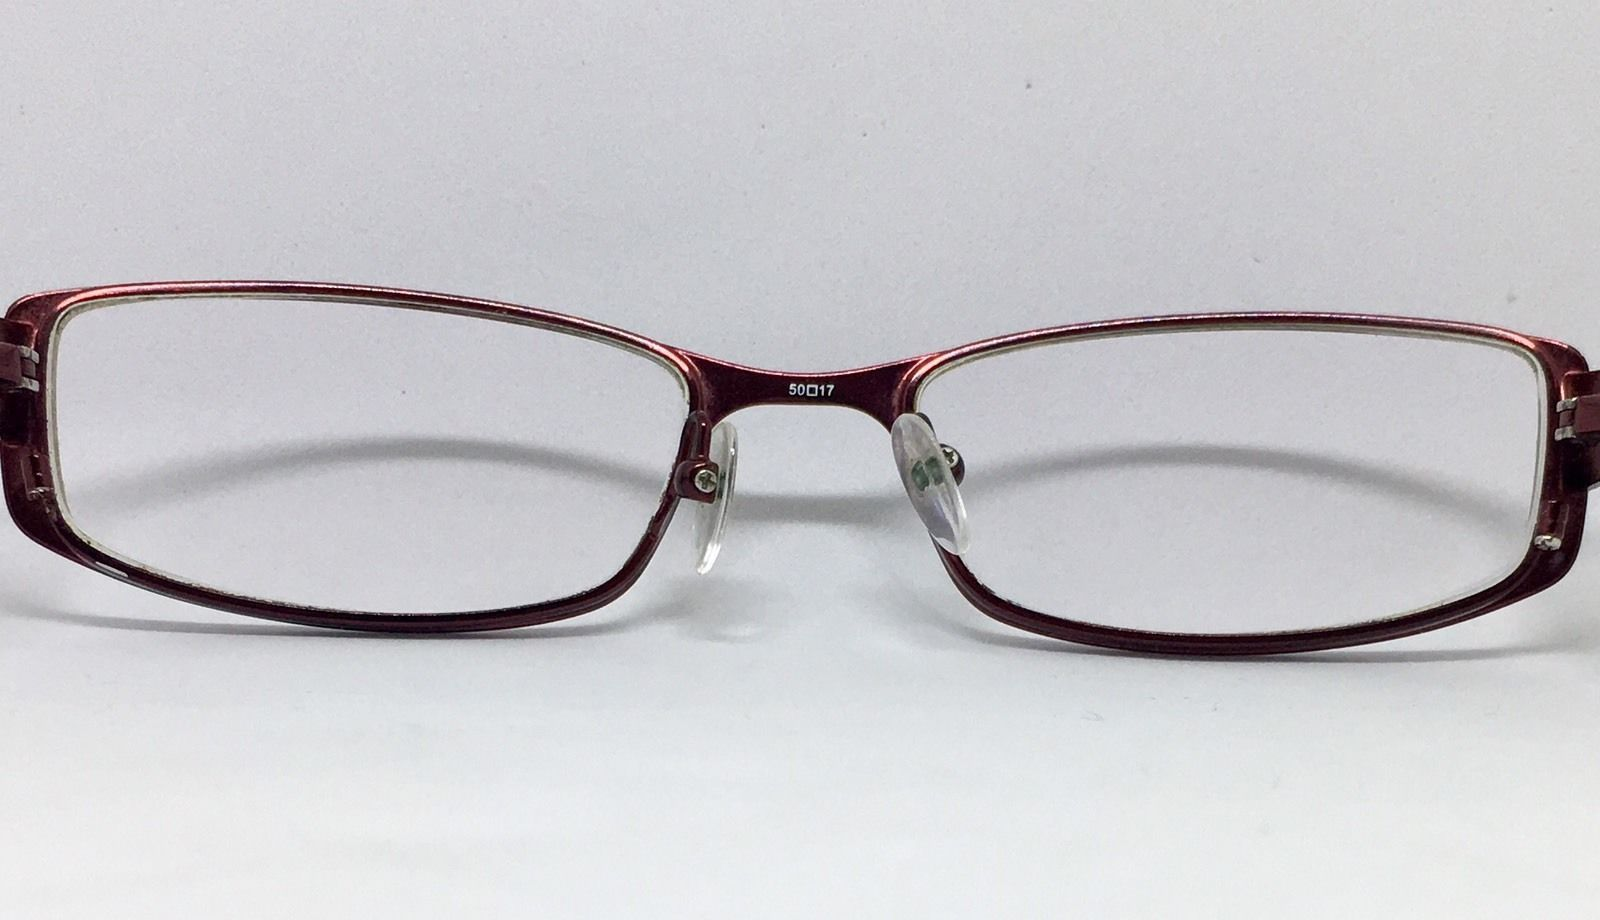 JILL STUART Eyeglasses Frames Bronze Metal and 12 similar items